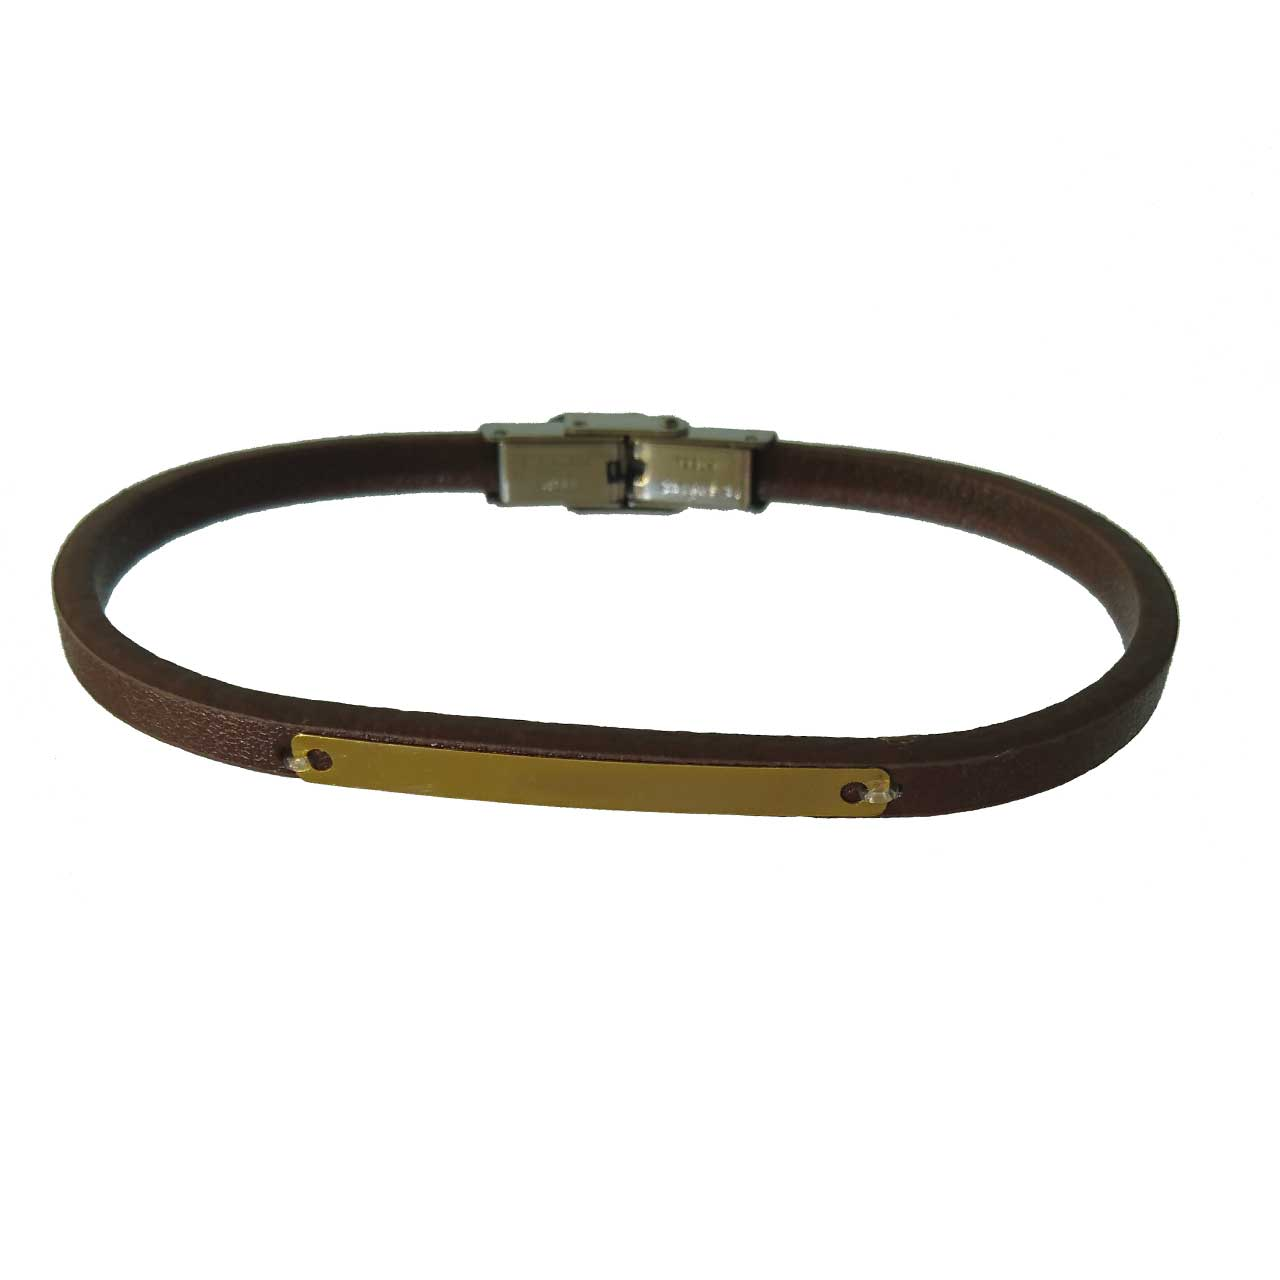 دستبند چرم طلا 18عیار کانیار گالری مدل D733